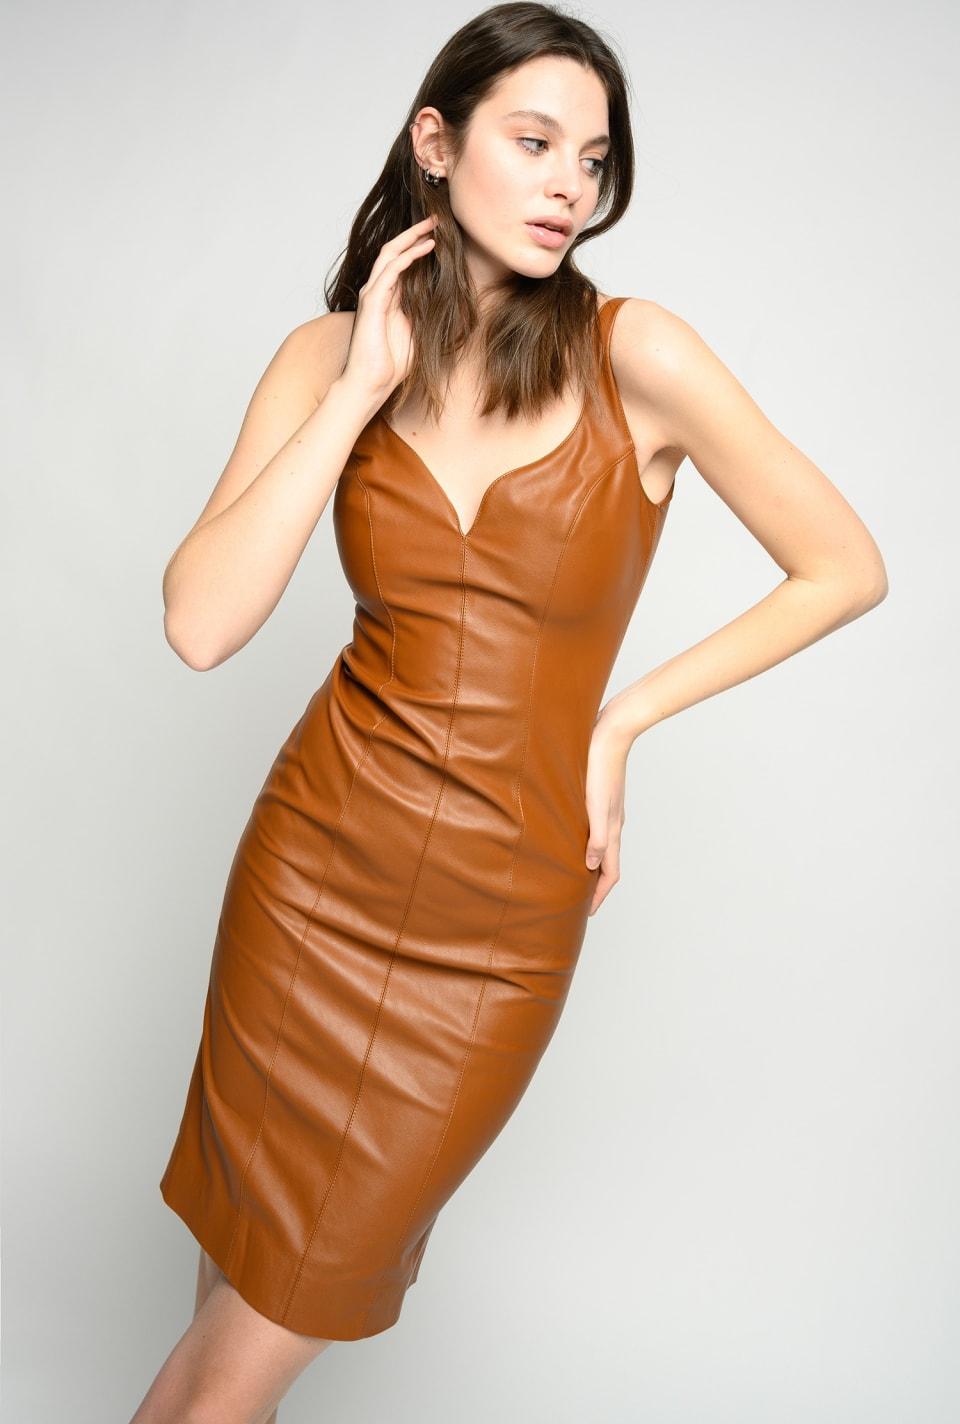 Leather-look sheath dress - Pinko